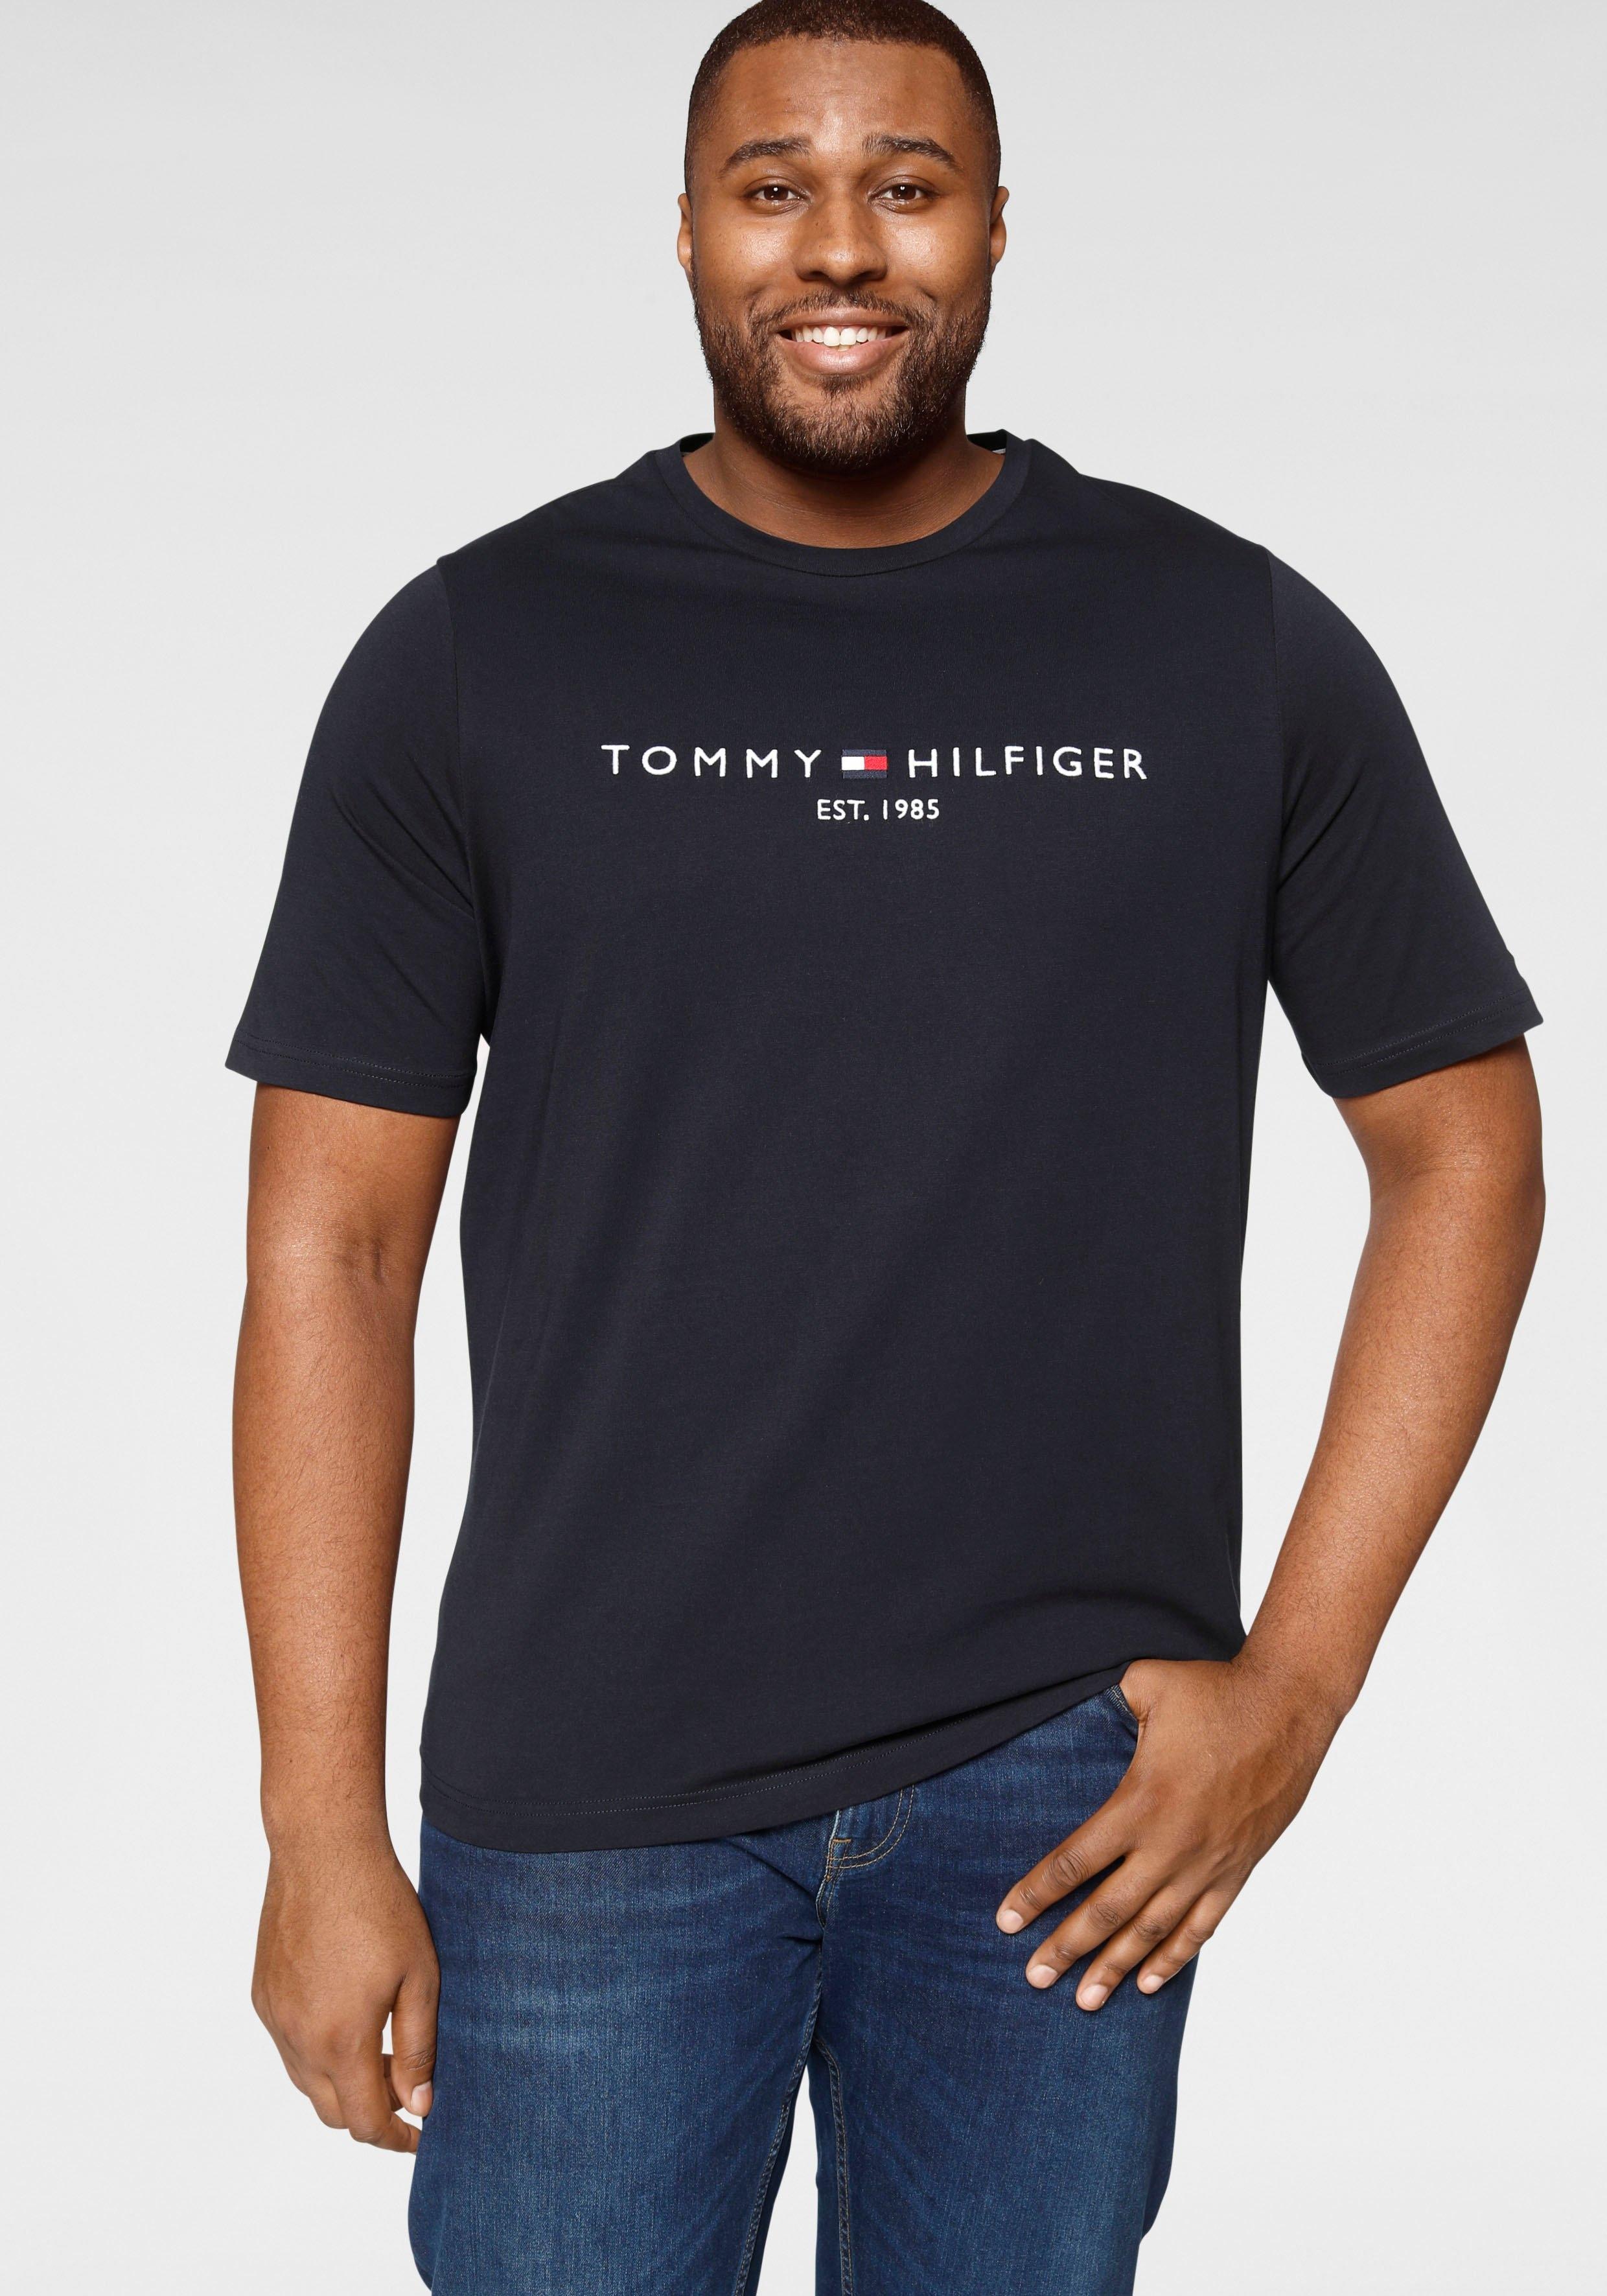 Tommy Hilfiger T-shirt BT- TOMMY LOGO TEE online kopen op otto.nl